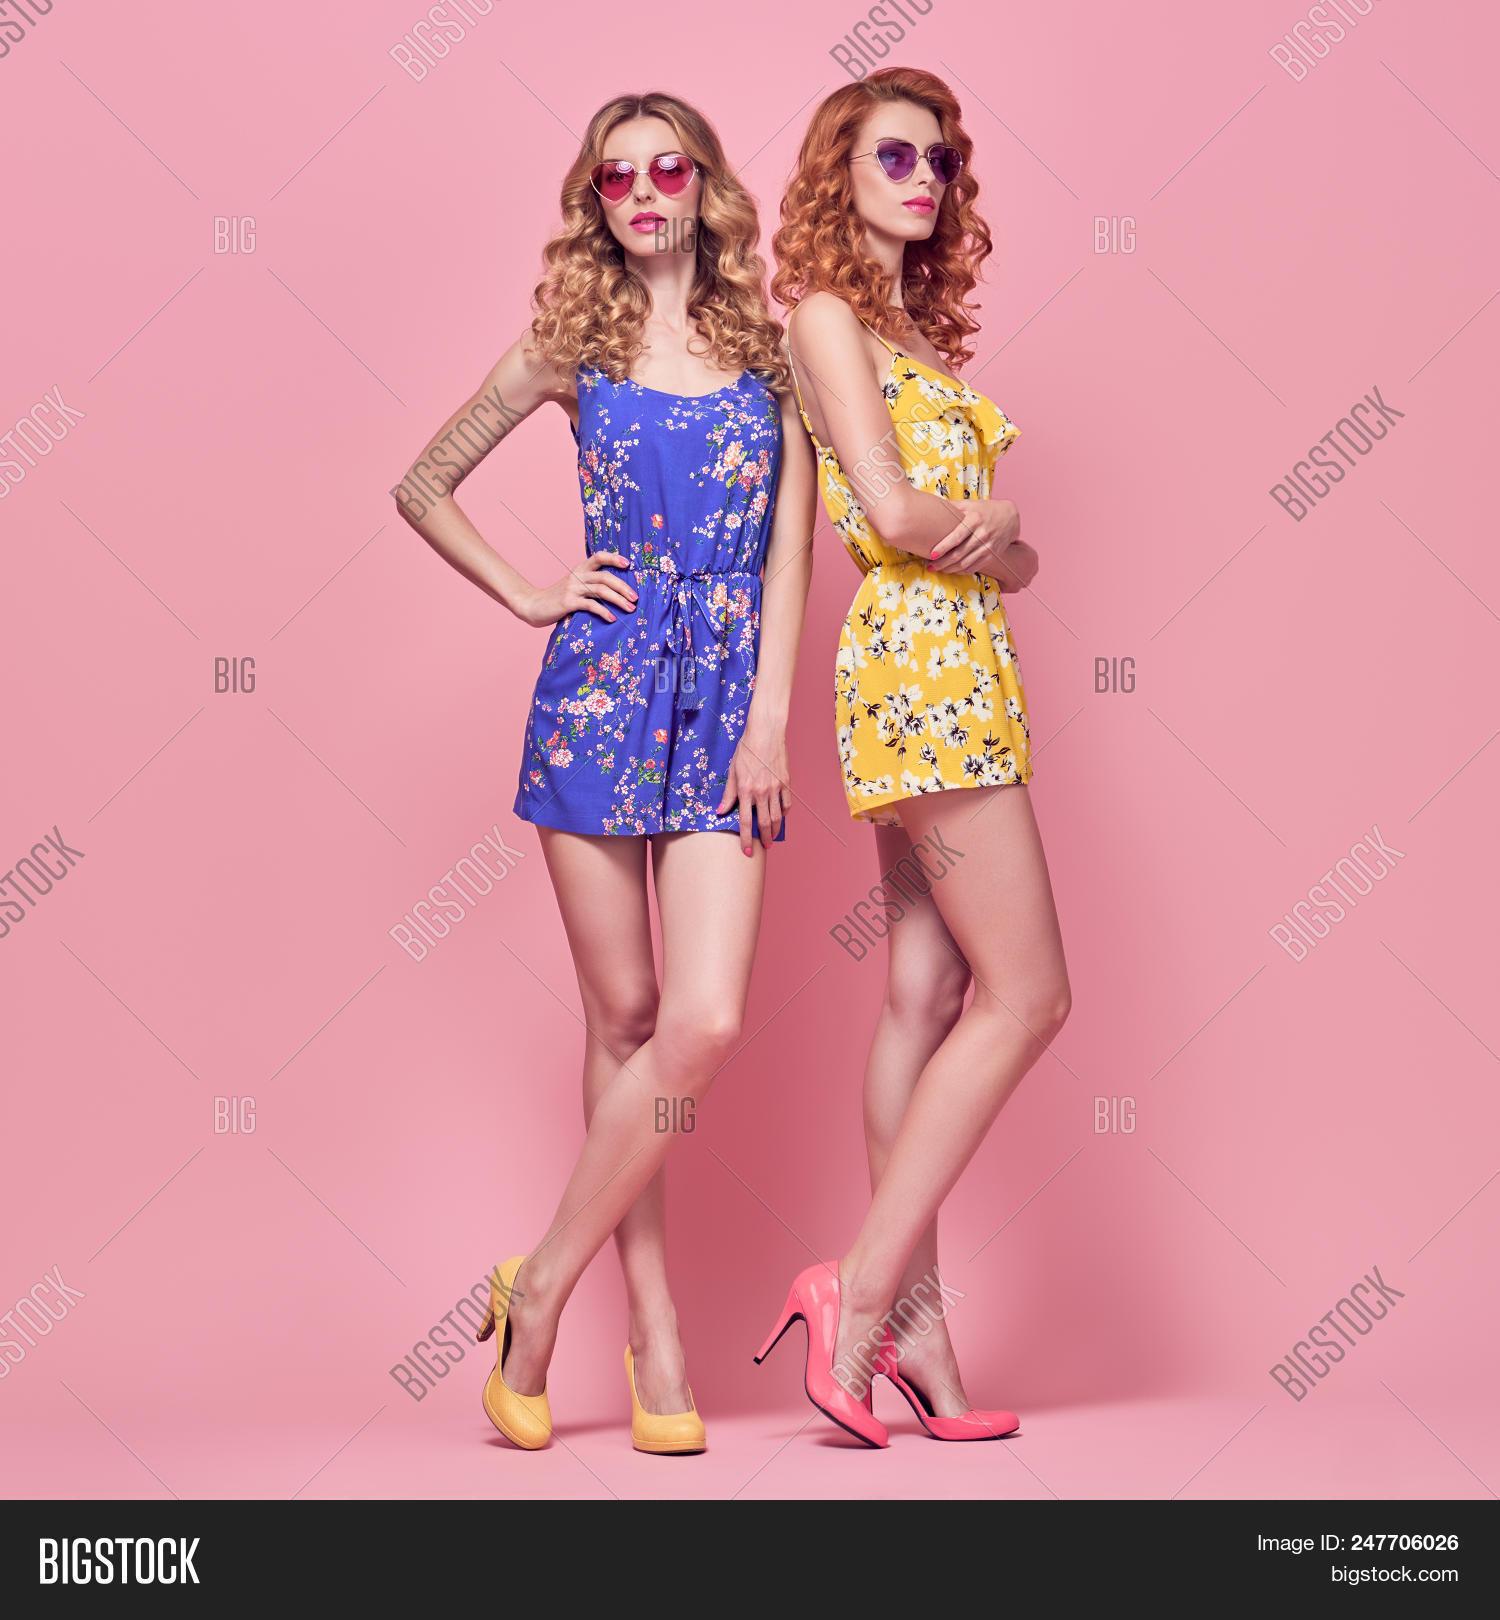 192cf1b88dfb Young Beautiful Playful Girls in Fashion pose. Stylish Outfit